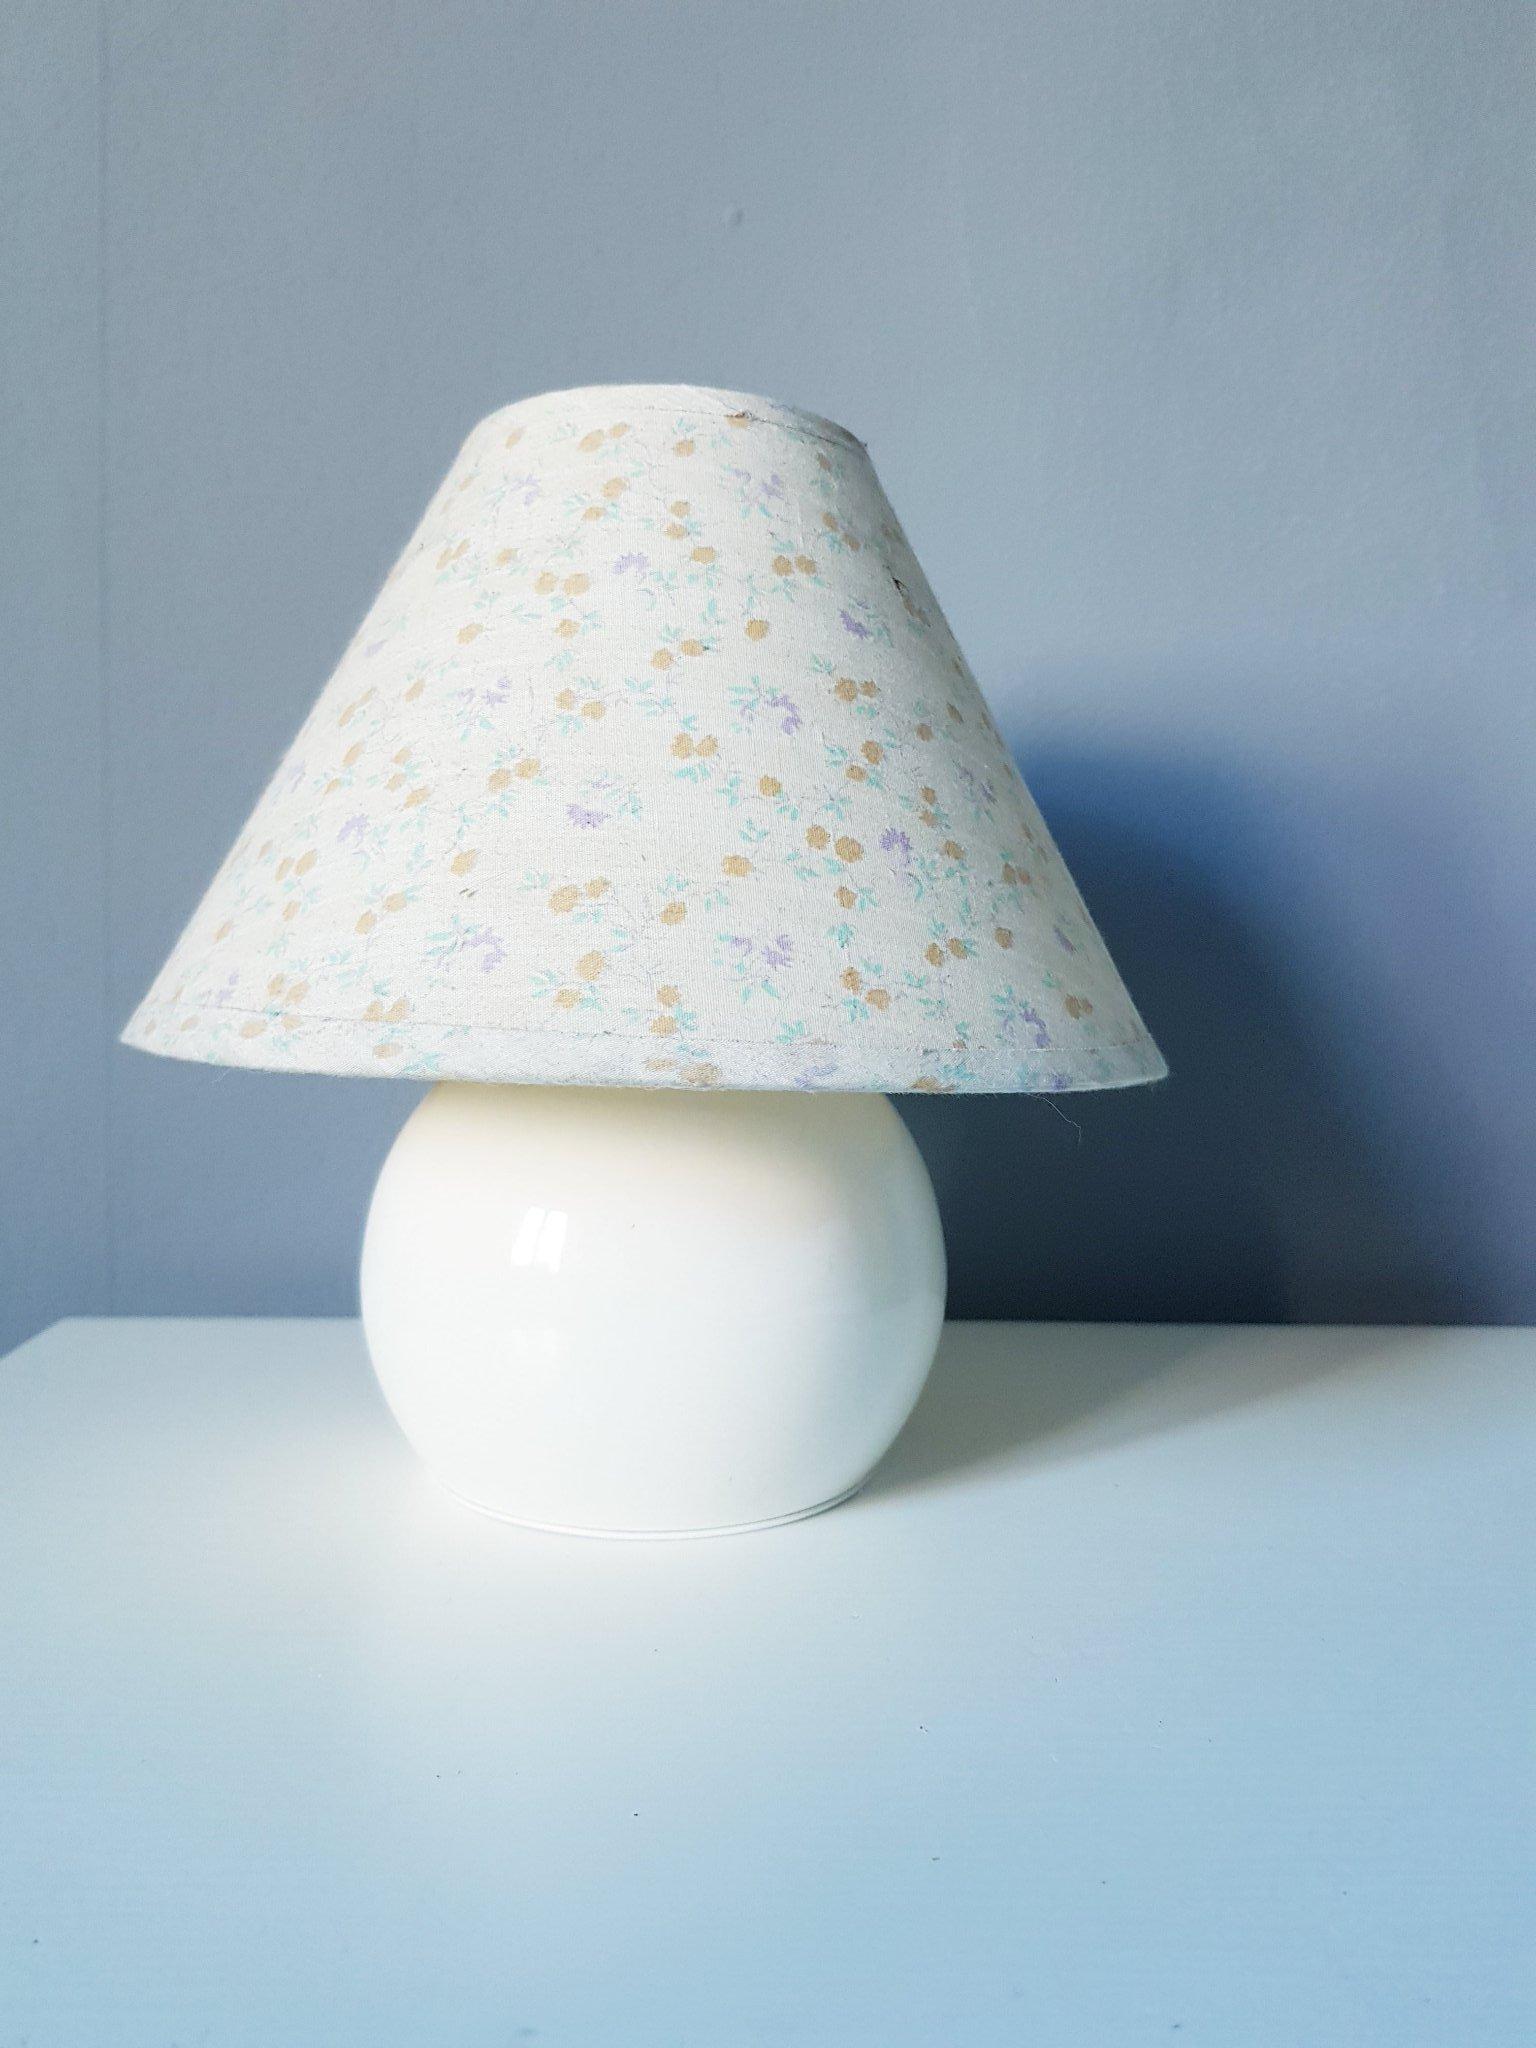 PARET 2STYCK IKEA RETRO BOLLLAMPOR LAMPA 80 90 TAL SVAMPLAMPA KLOT